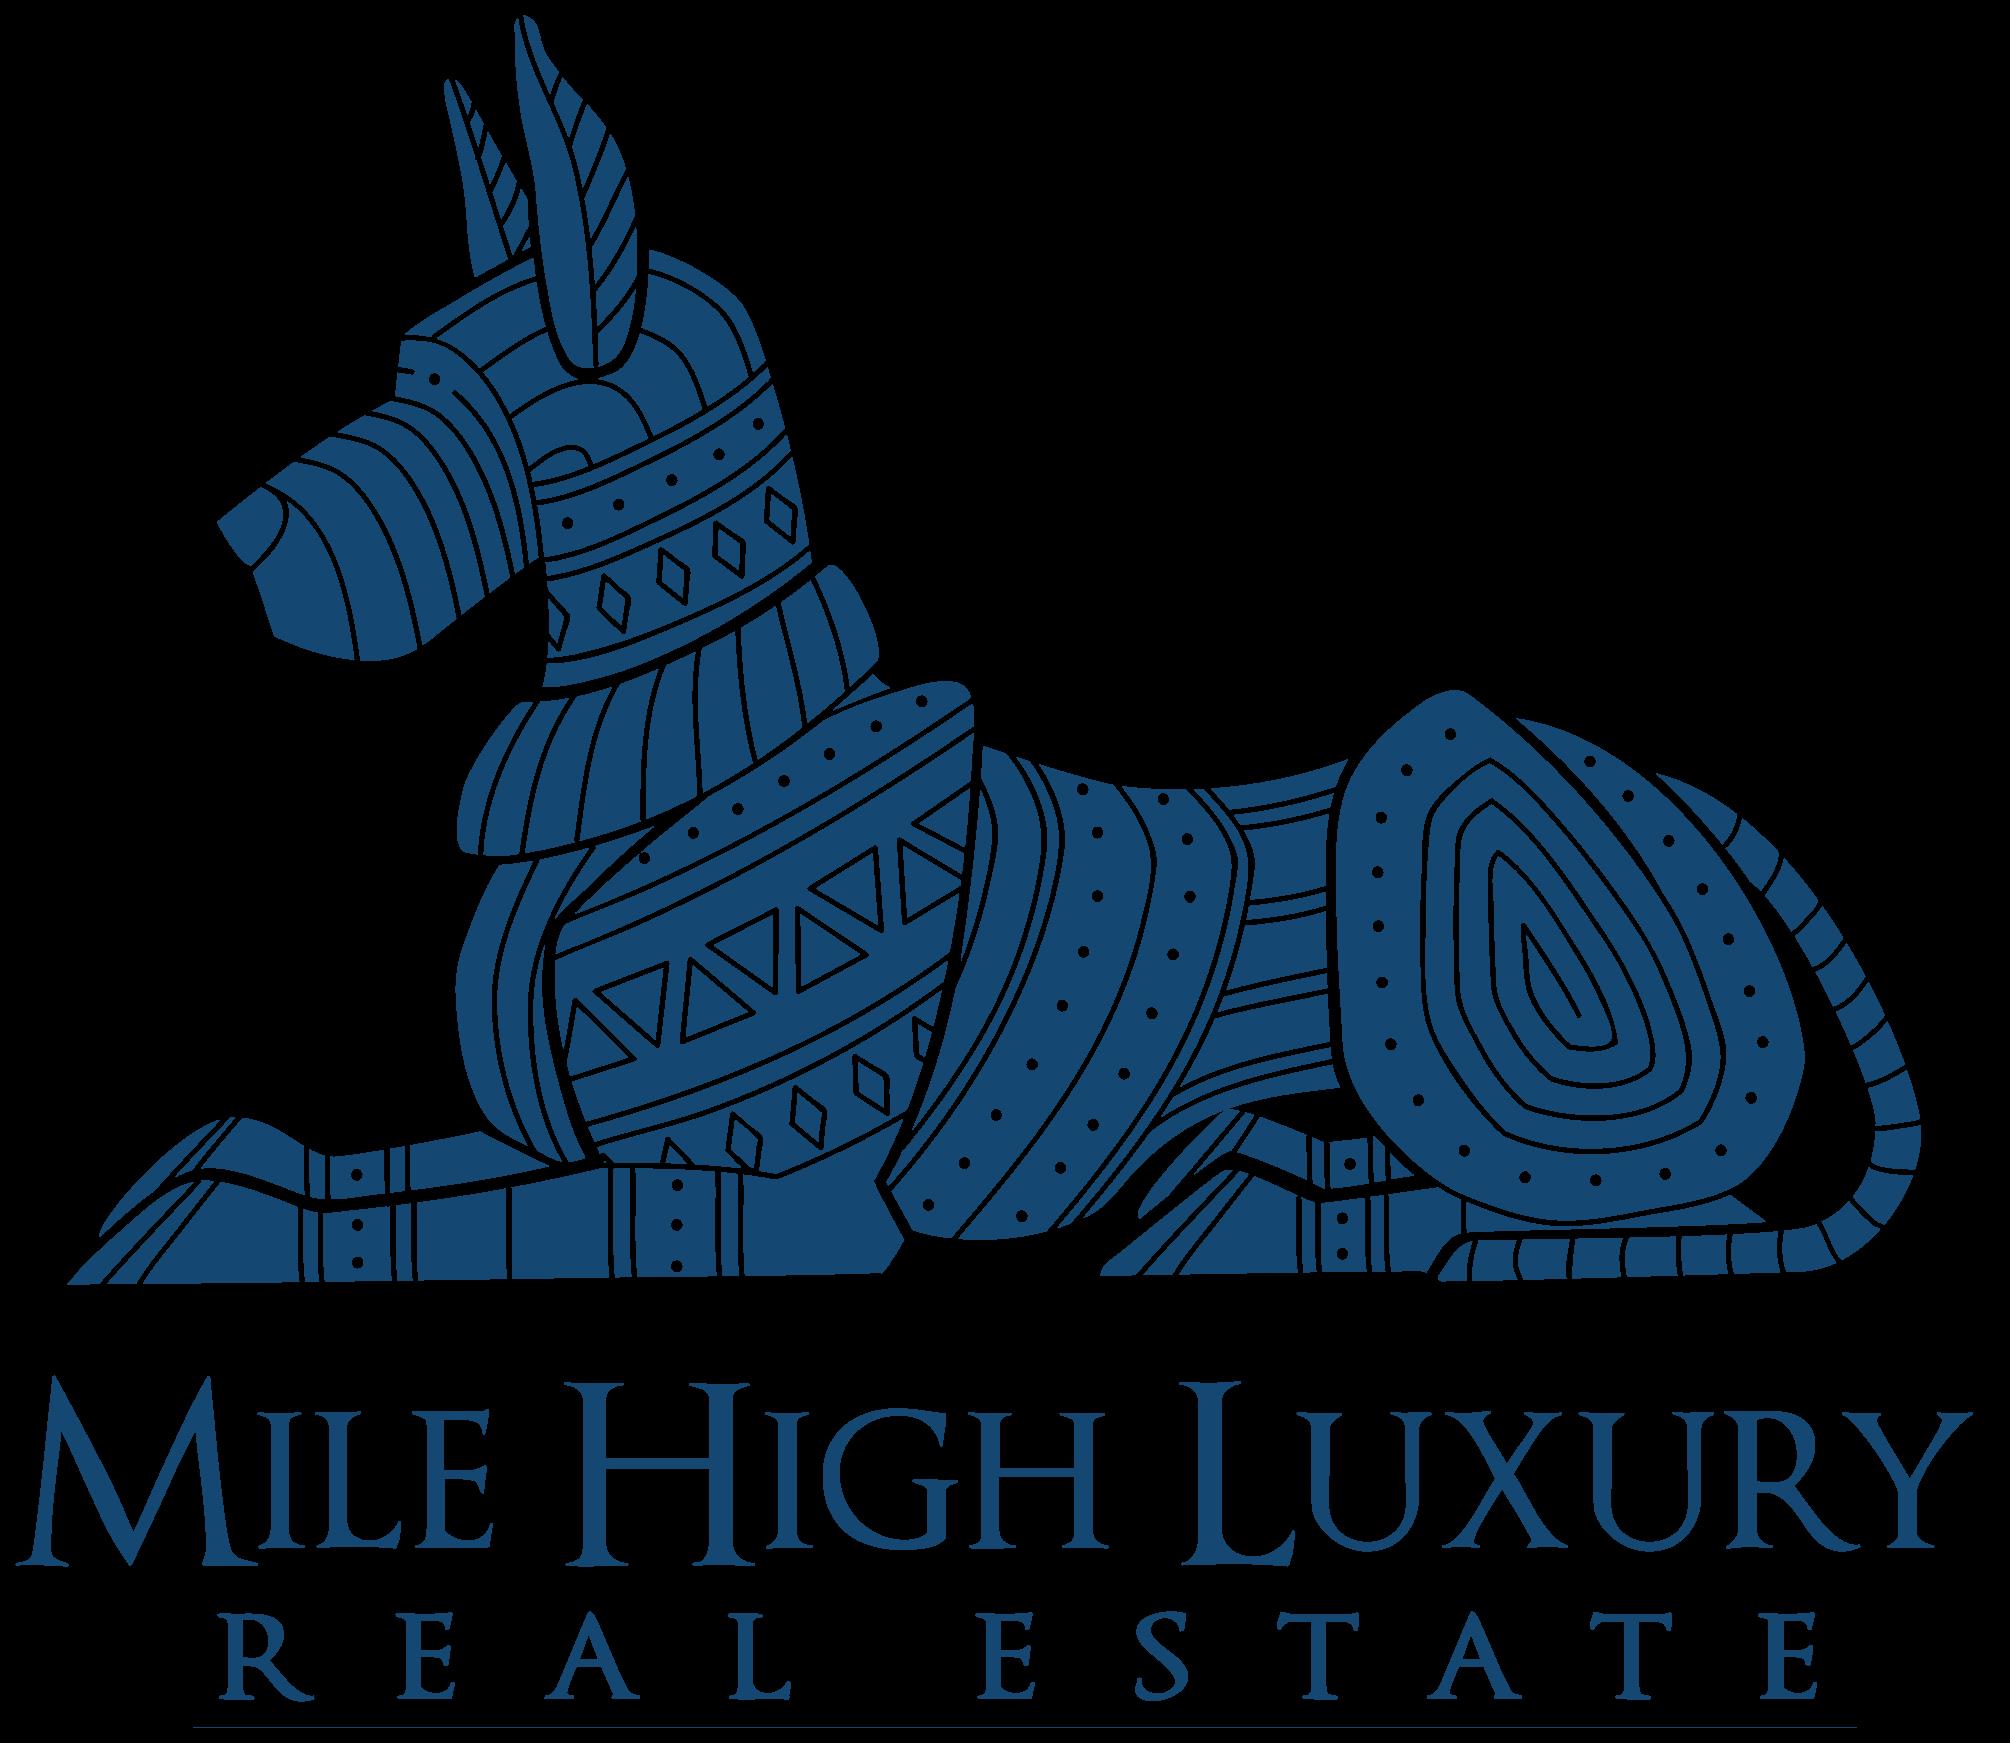 Kori Biernacki - mile high luxury logo blue on transparent black-04 (002).png